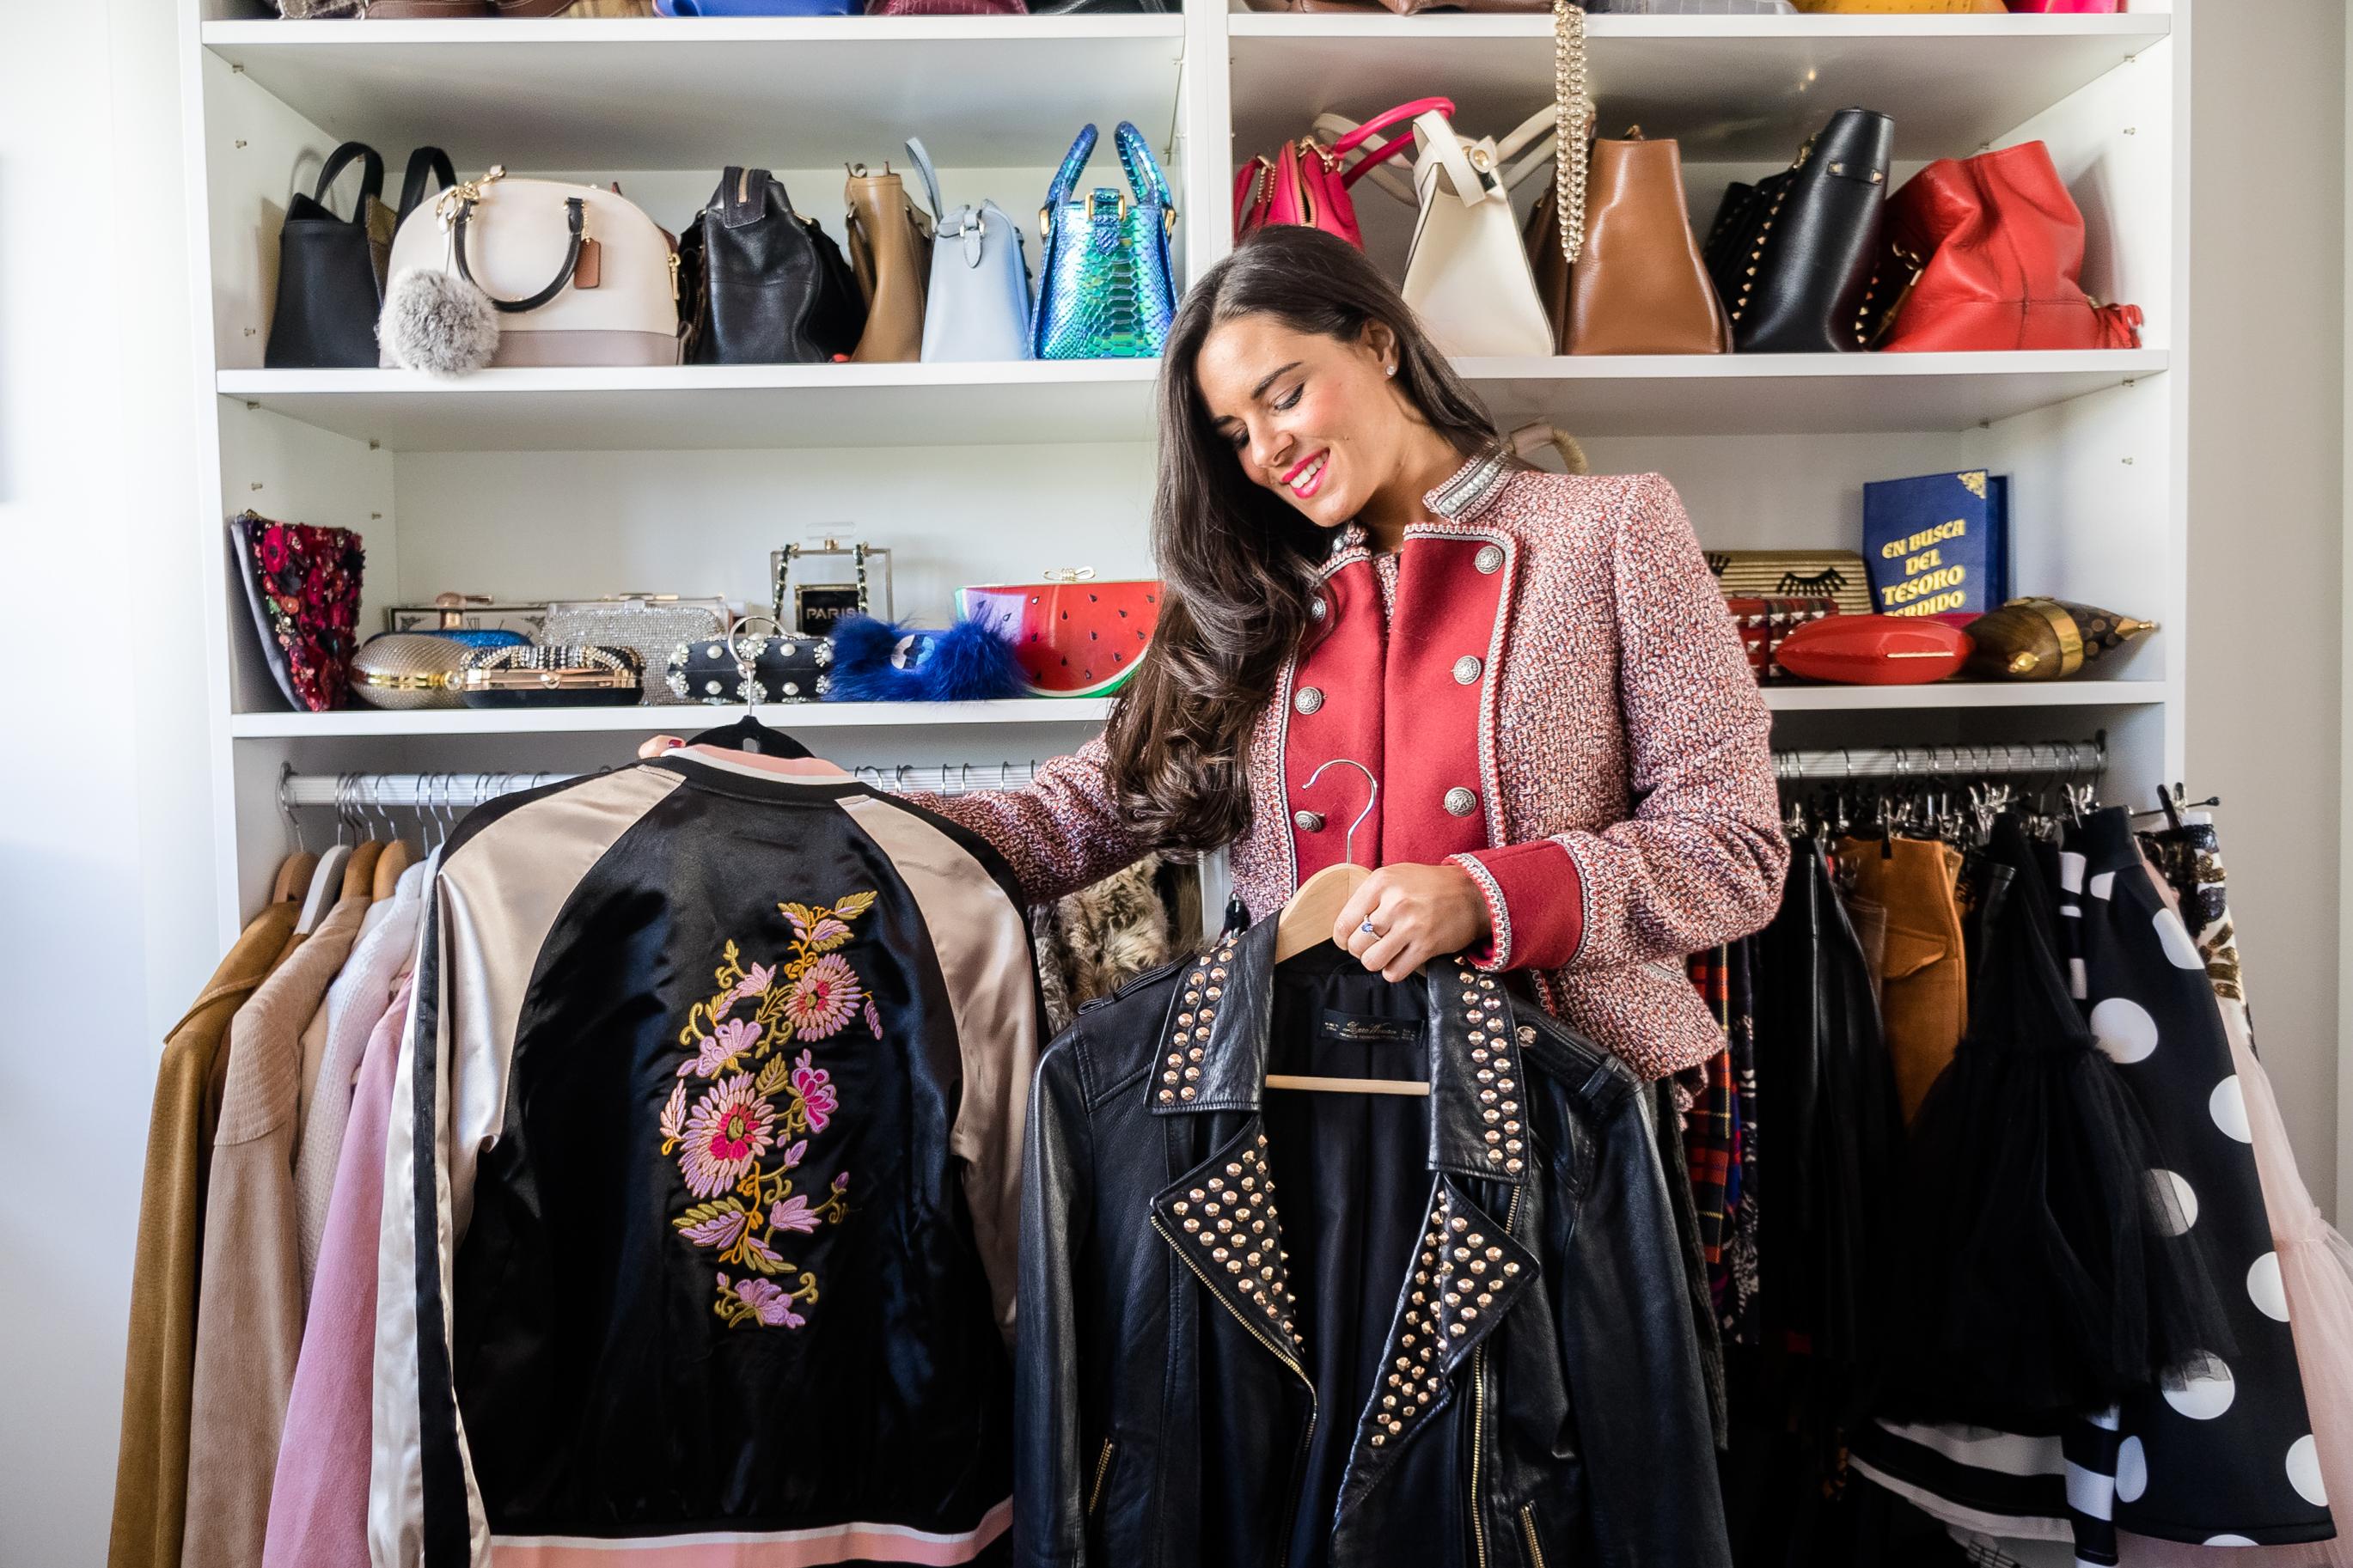 Mis favoritos en tendencia moda otoño 2016 Crimenes de la Moda blog Maria Jesus Garnica Navarro